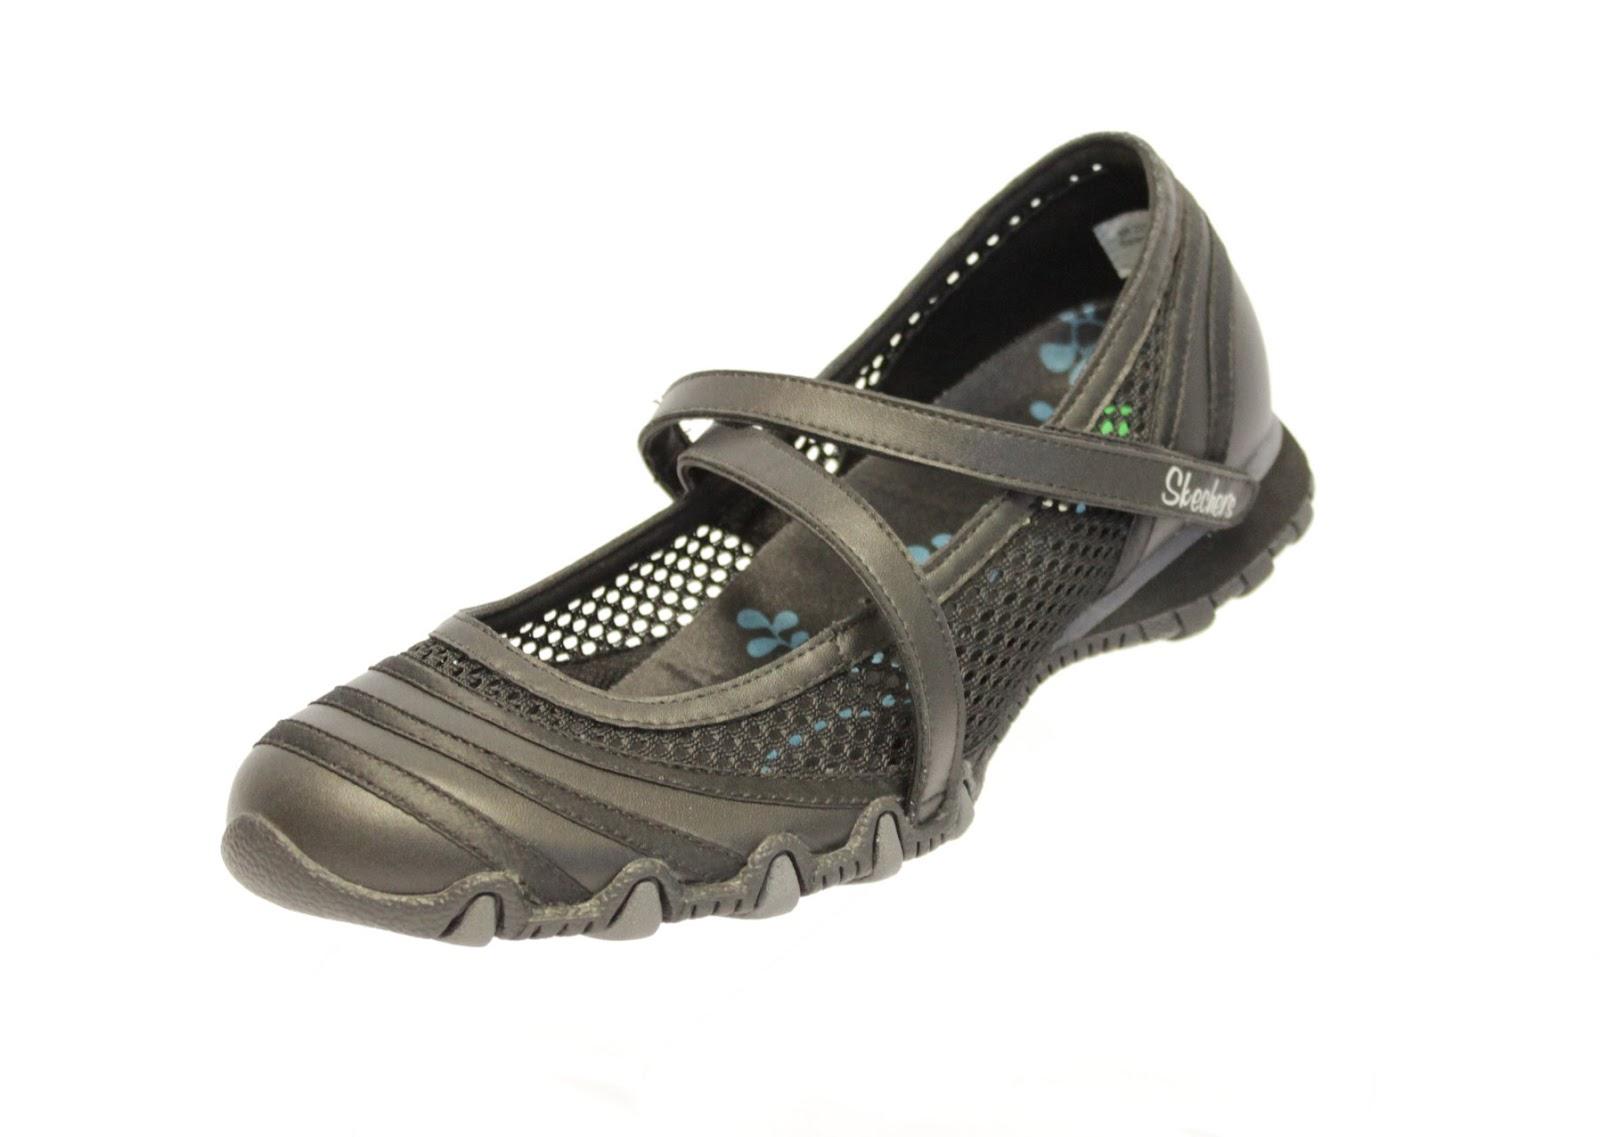 c49cd0d93f9 ... de calçados vice-líder de vendas nos EUA apresenta a Women s Active